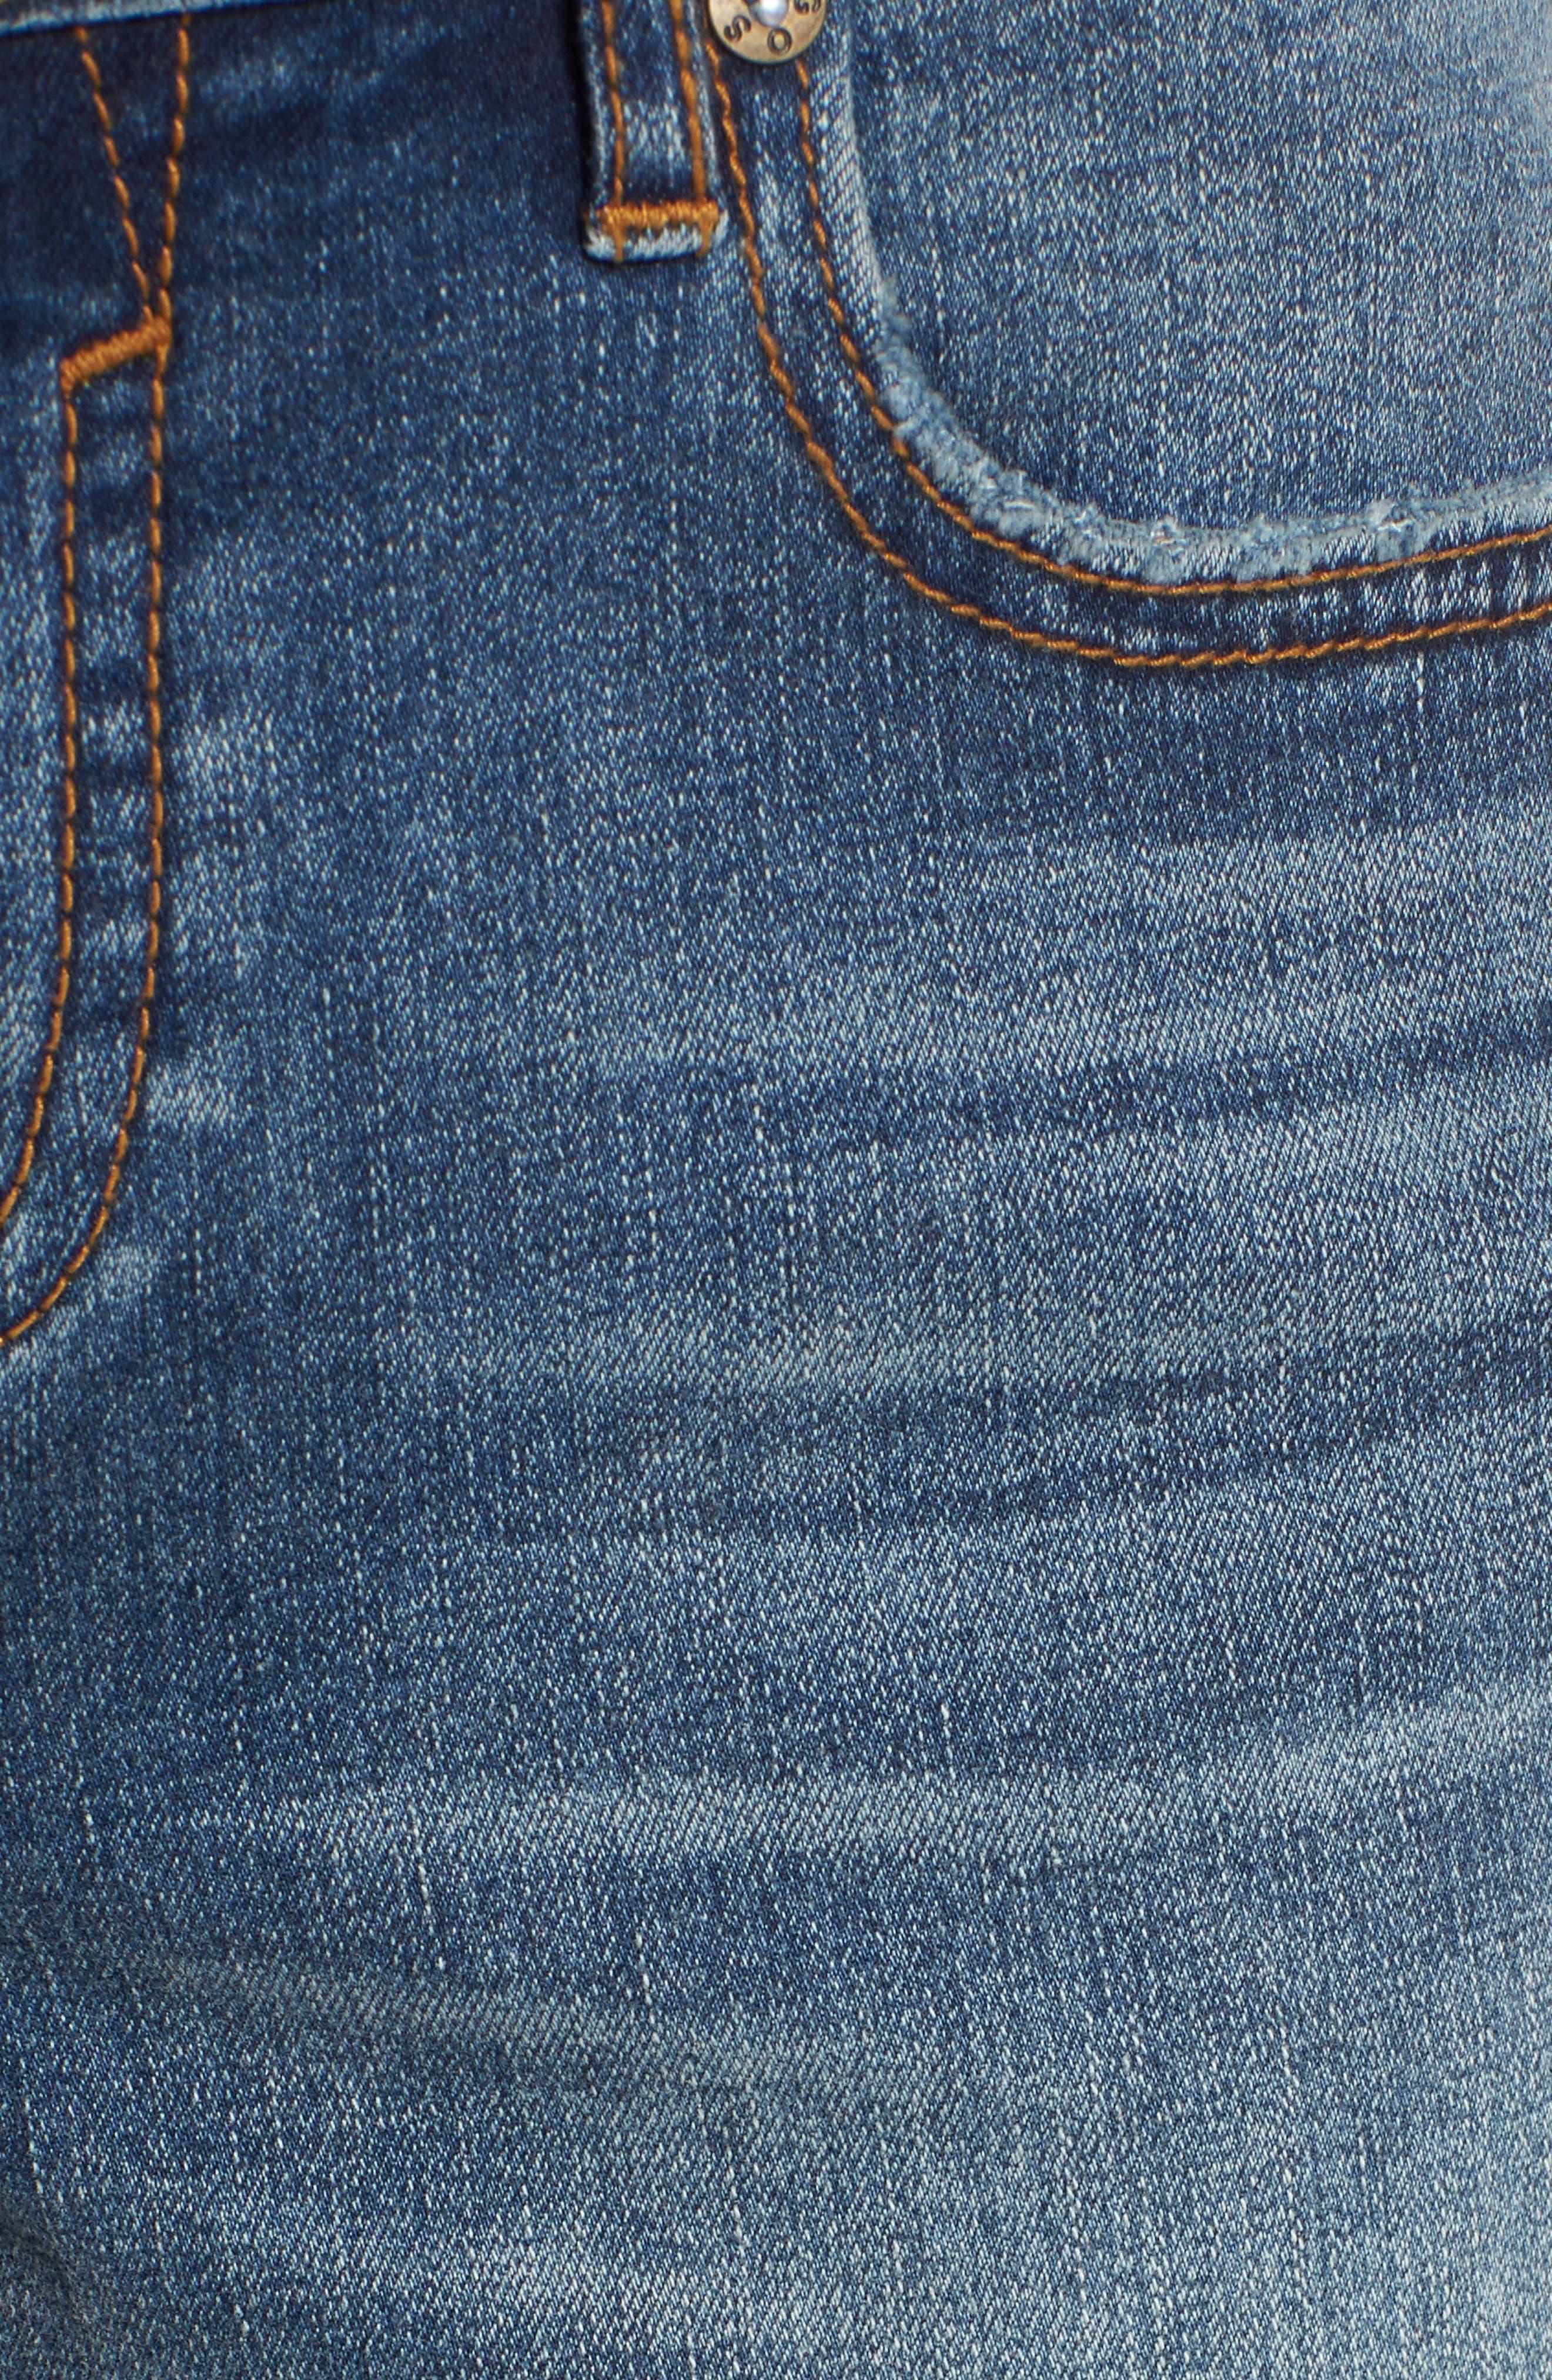 Distressed Denim Bermuda Shorts,                             Alternate thumbnail 5, color,